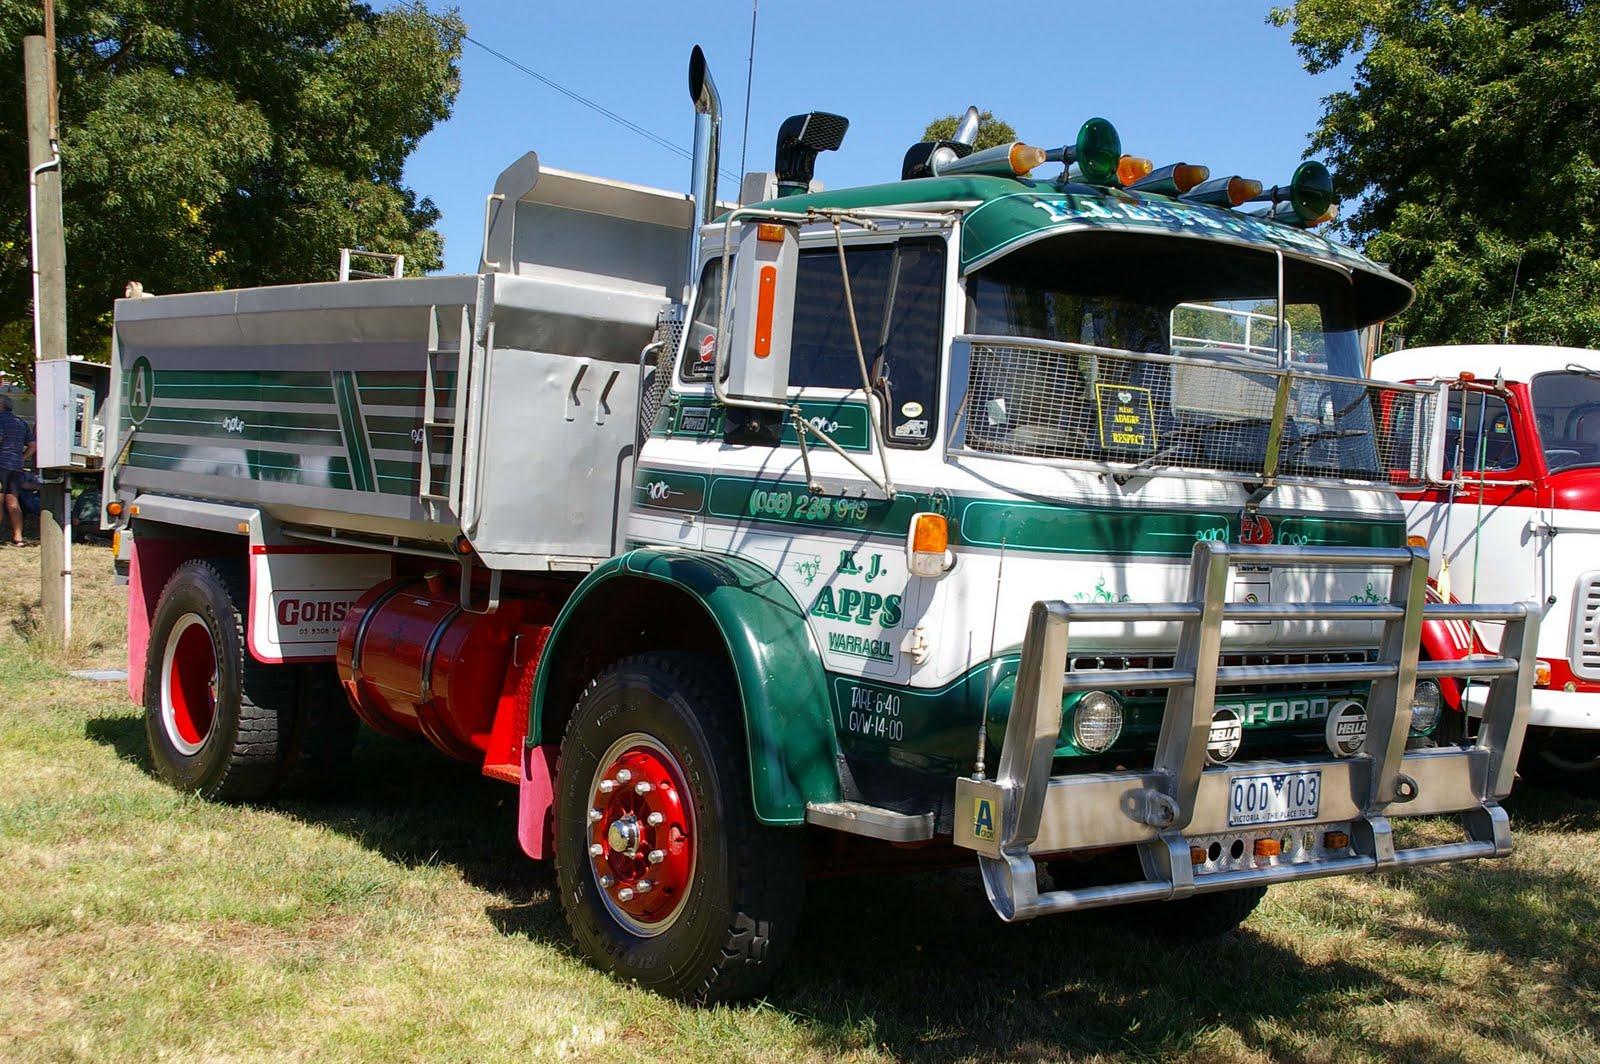 Historic Trucks Trucks In Action 2010 Part 3